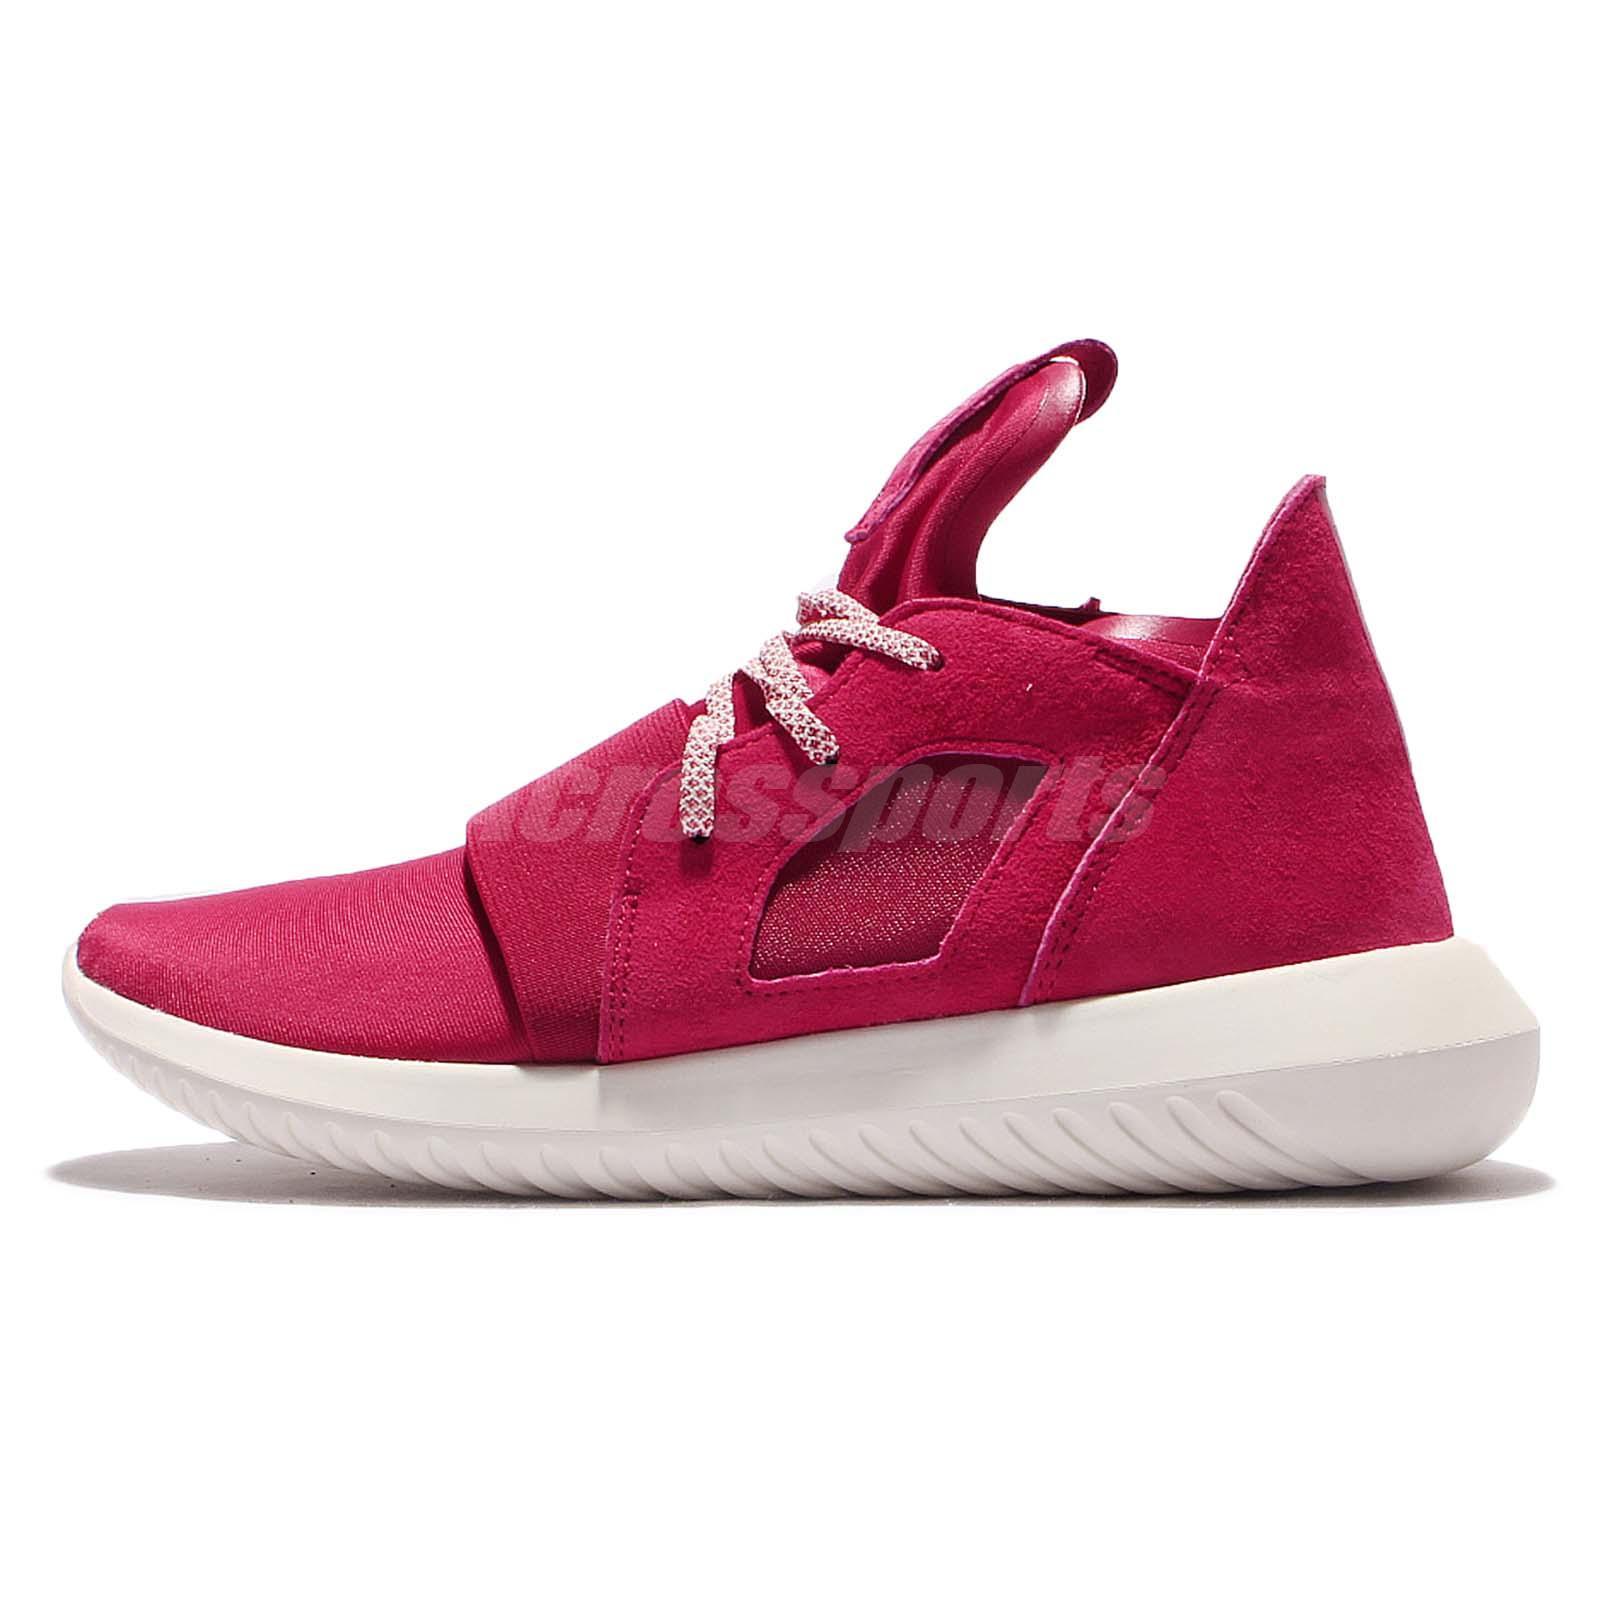 Adidas Tubular Mono Red Ebay